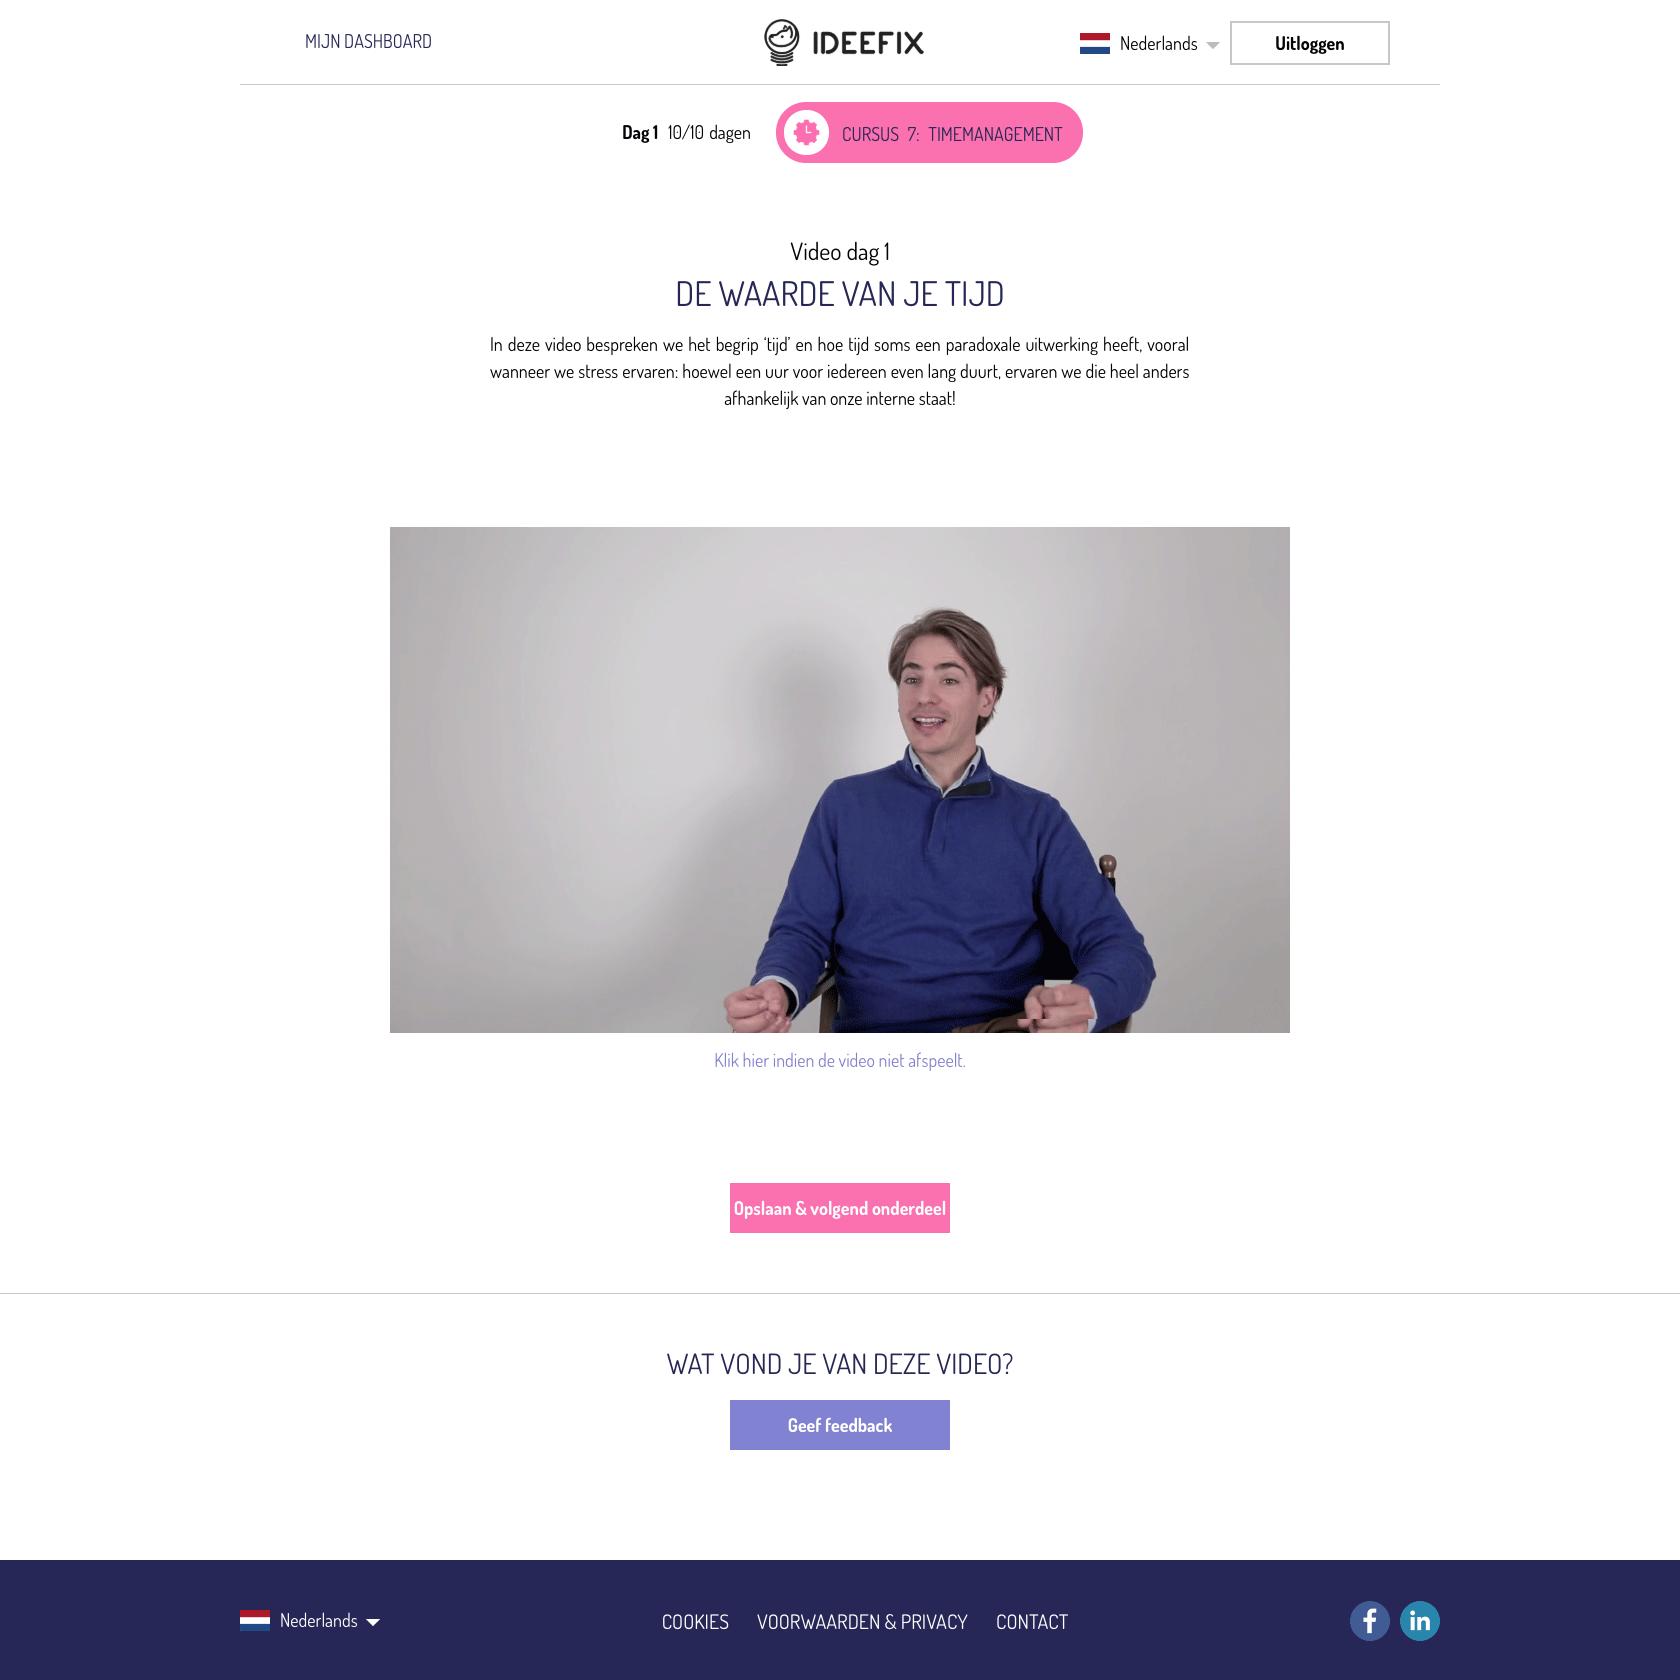 https://ideefix-cdn.s3.eu-central-1.amazonaws.com/module_screenshot/LBcUn3UdSReHuu2ApfcS_picture.png